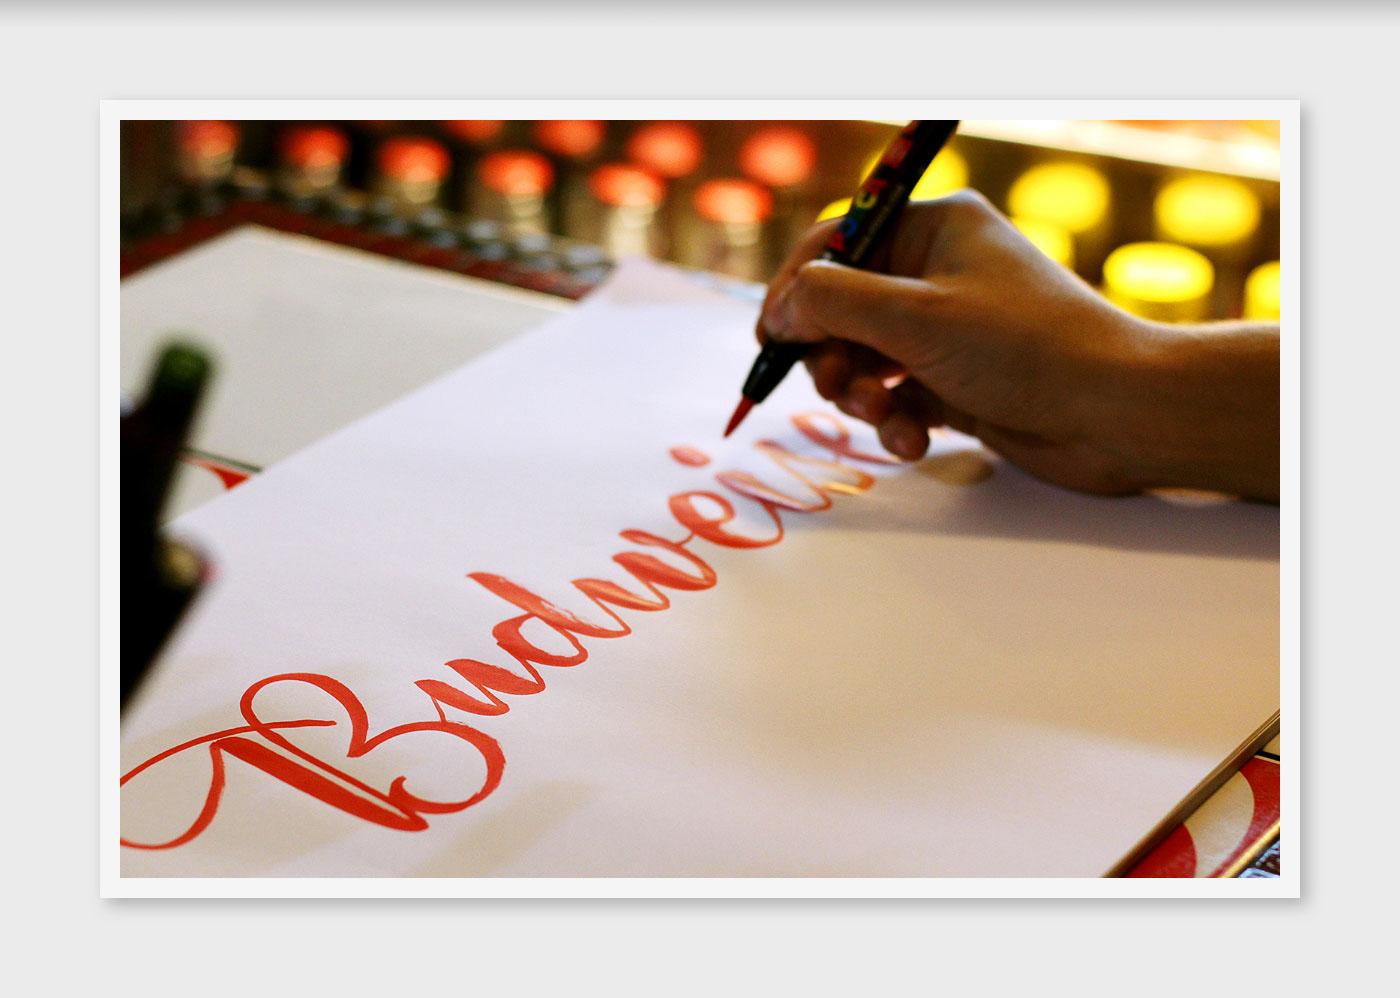 caligrafia live handmande handwriting Budweiser Calligraphy team tipografia lettering